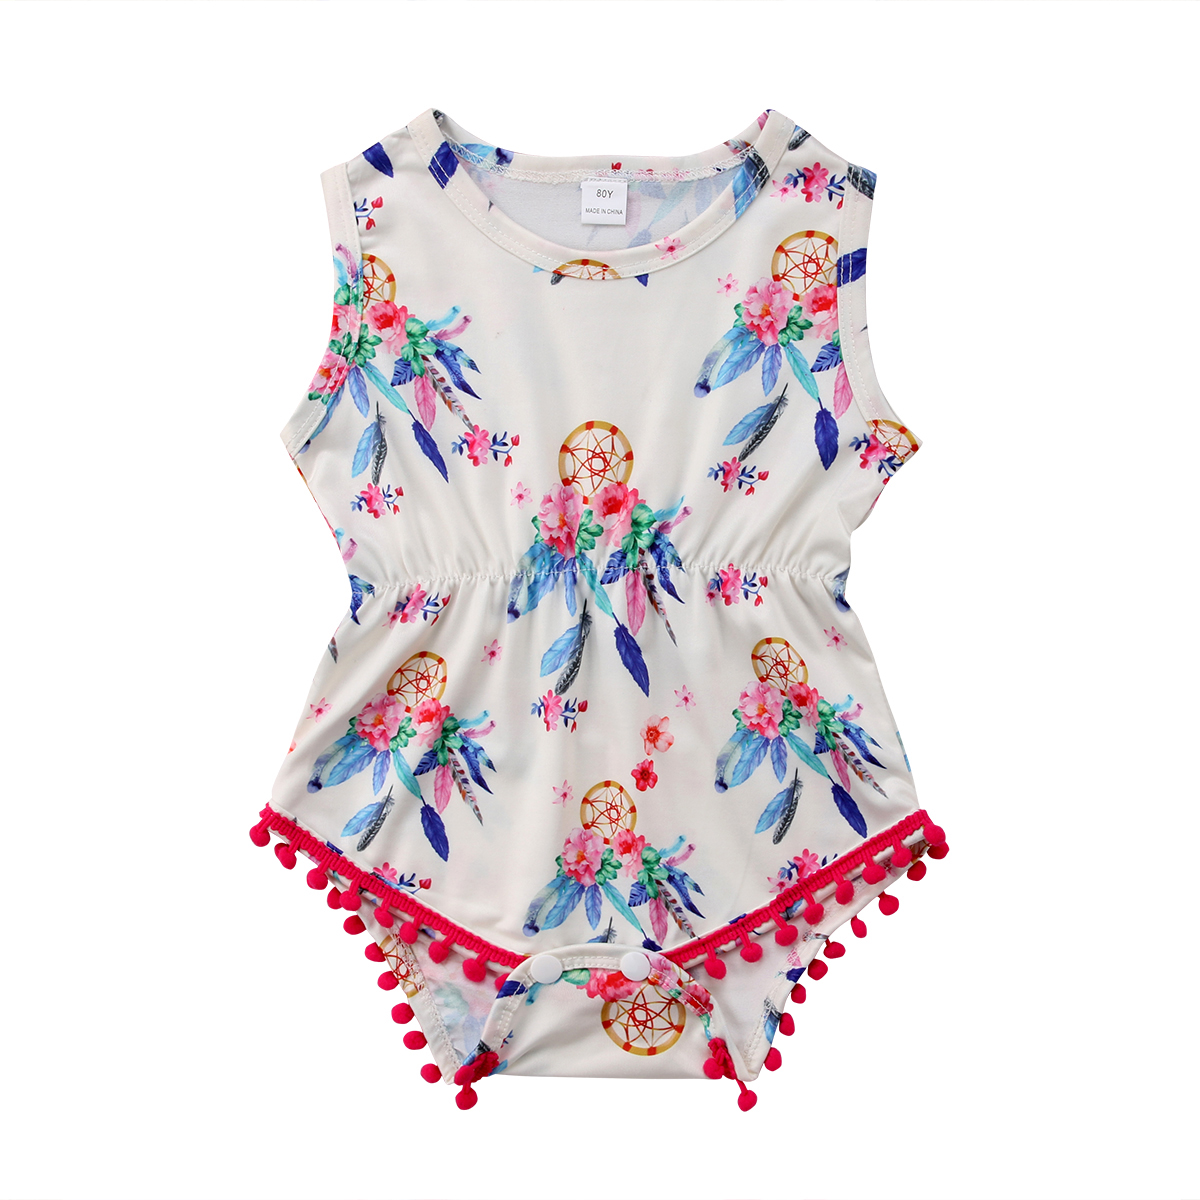 0cd0867abf34 Pretty Tassel   Floral Romper Newborn Baby Girl Jumpsuit Playsuit Summer  Clothes